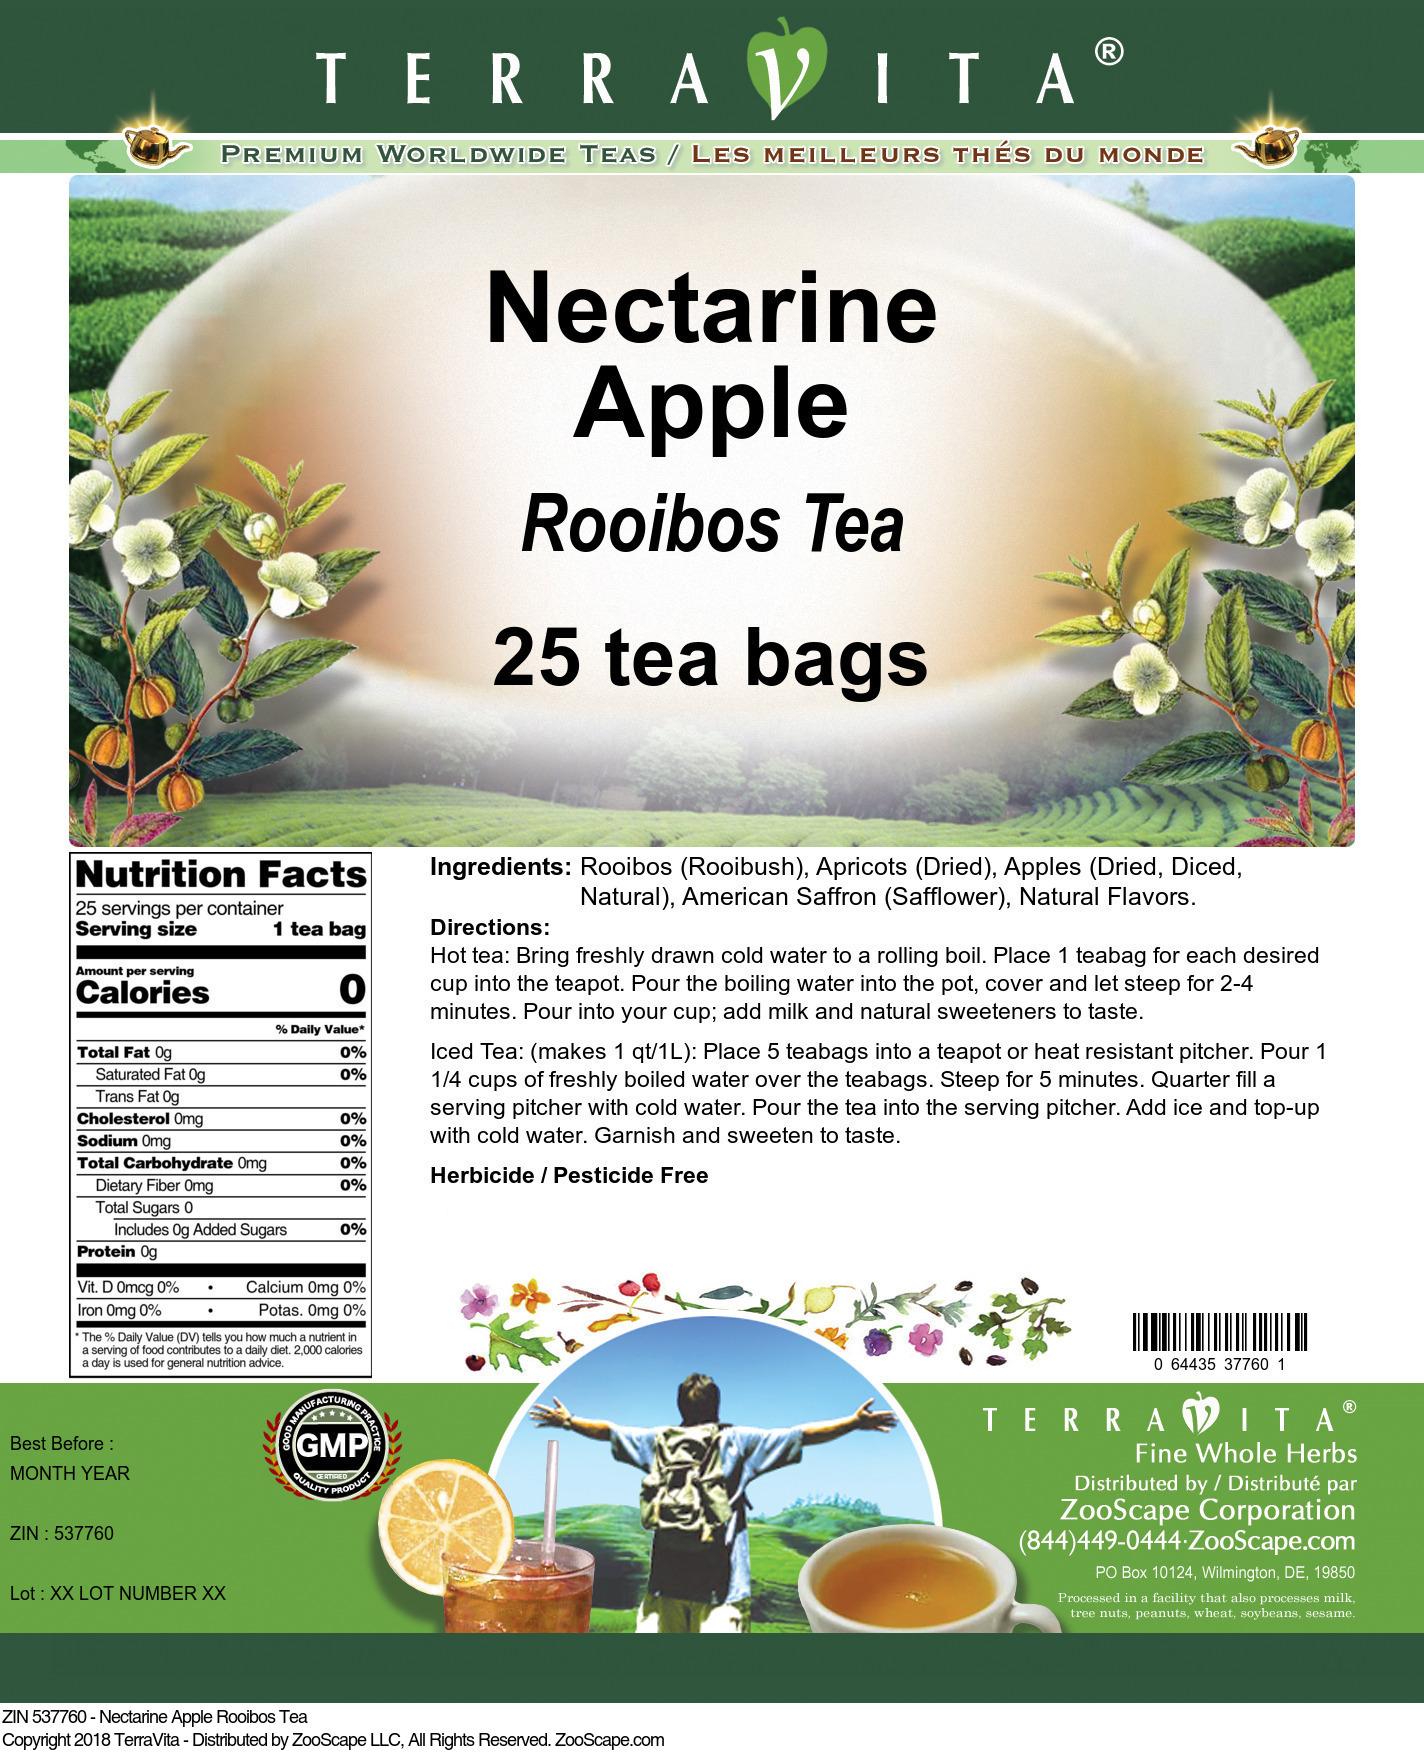 Nectarine Apple Rooibos Tea